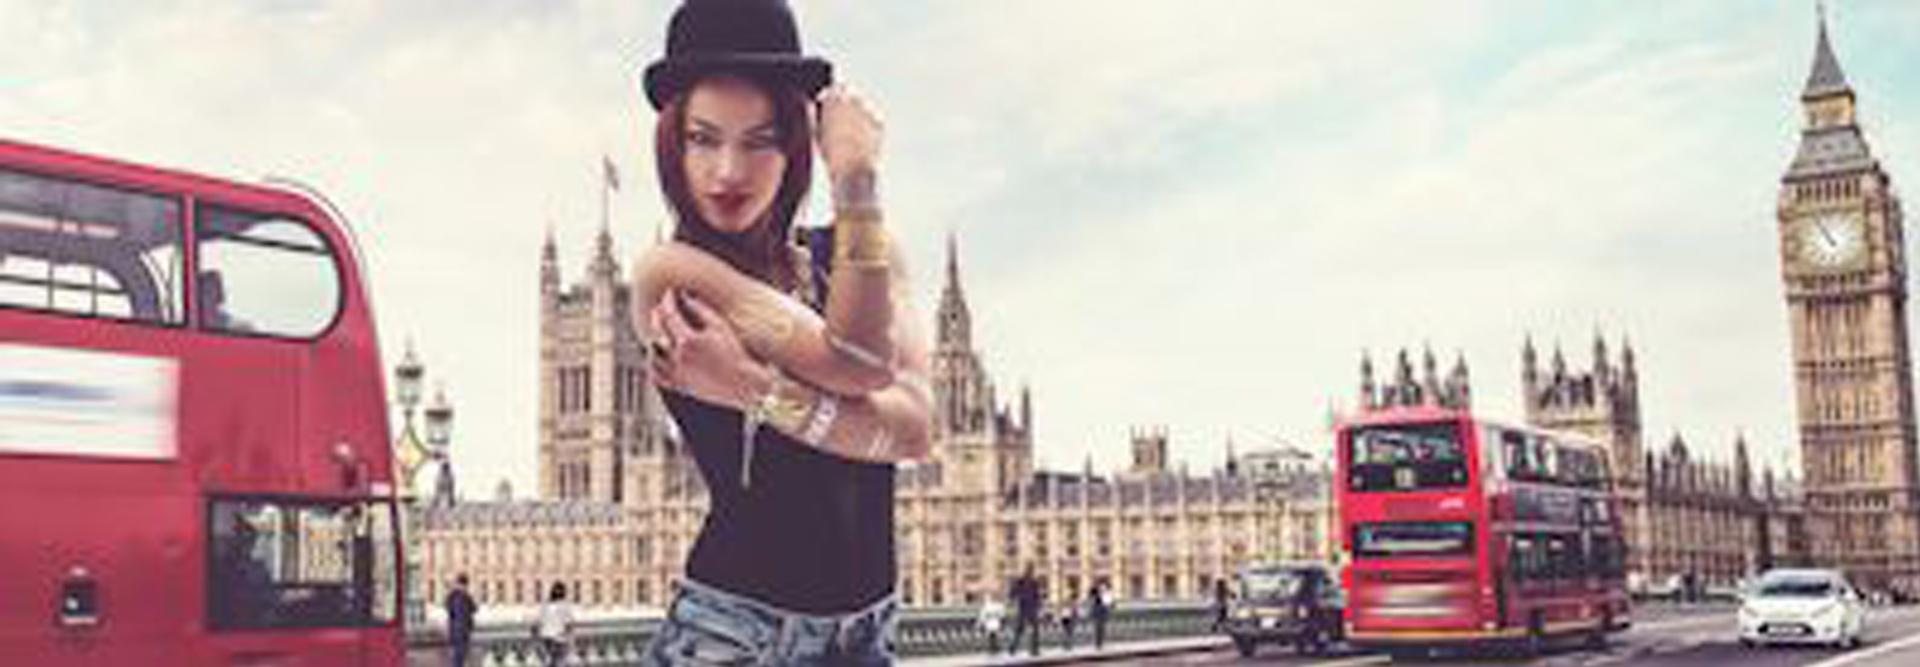 luxxink_london01